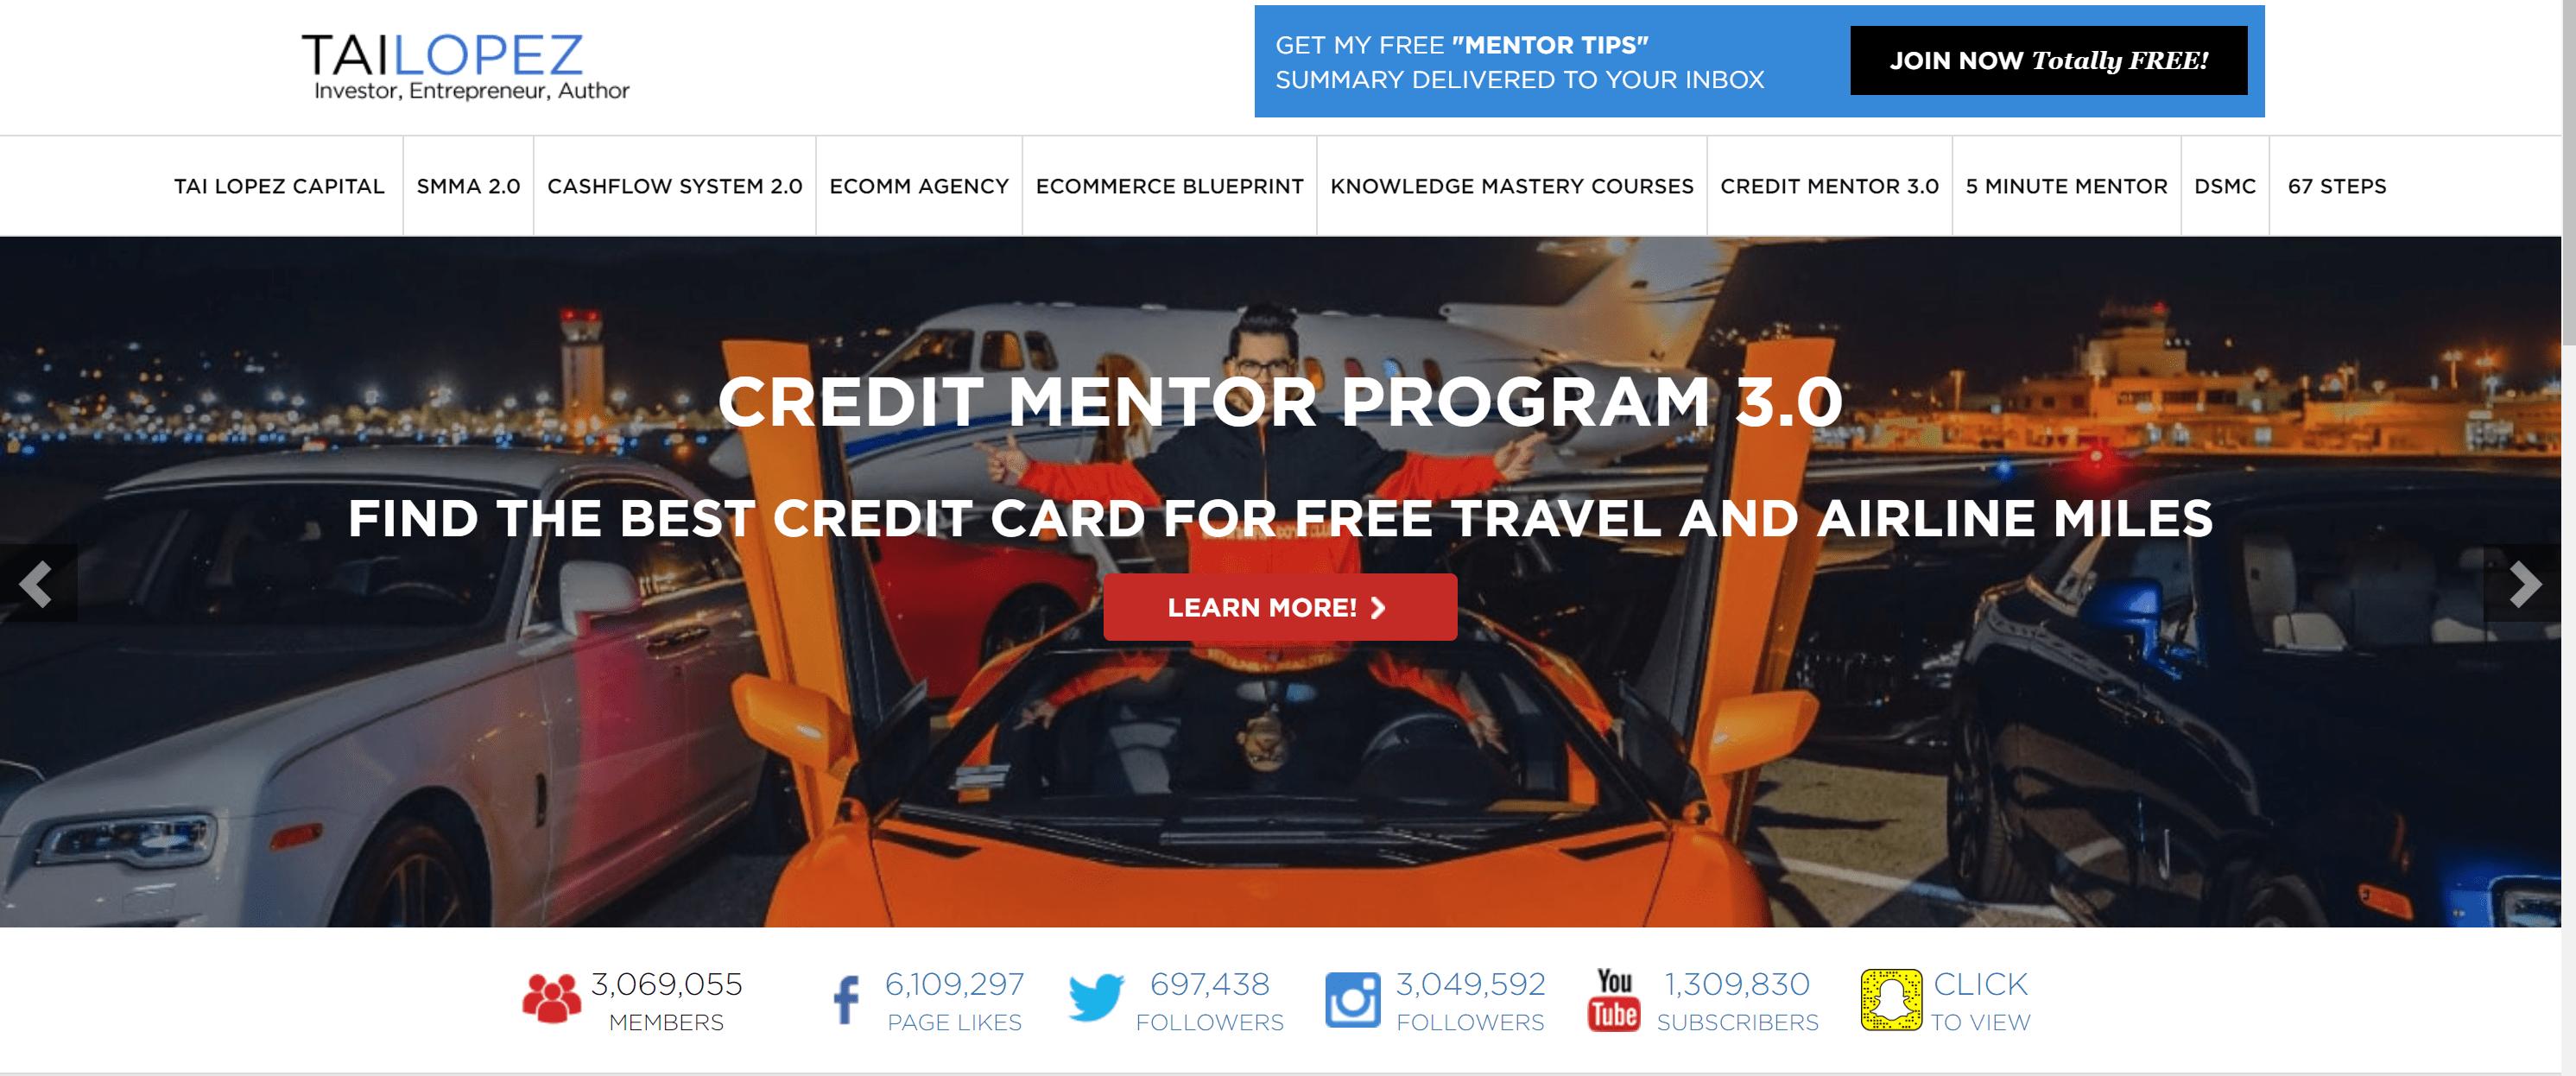 Tai Lopez Review - Credit mentor program 3.0